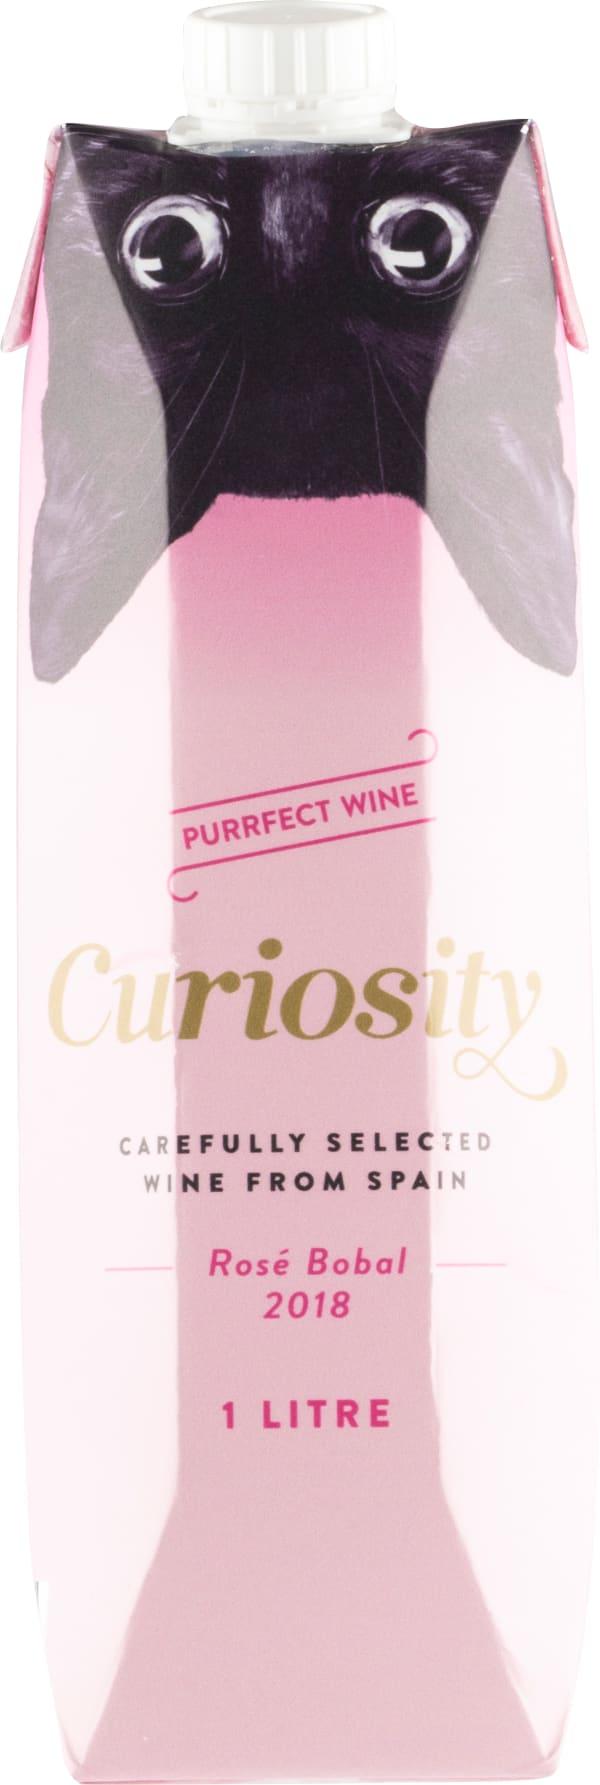 Curiosity Rosé Bobal 2018 kartongförpackning